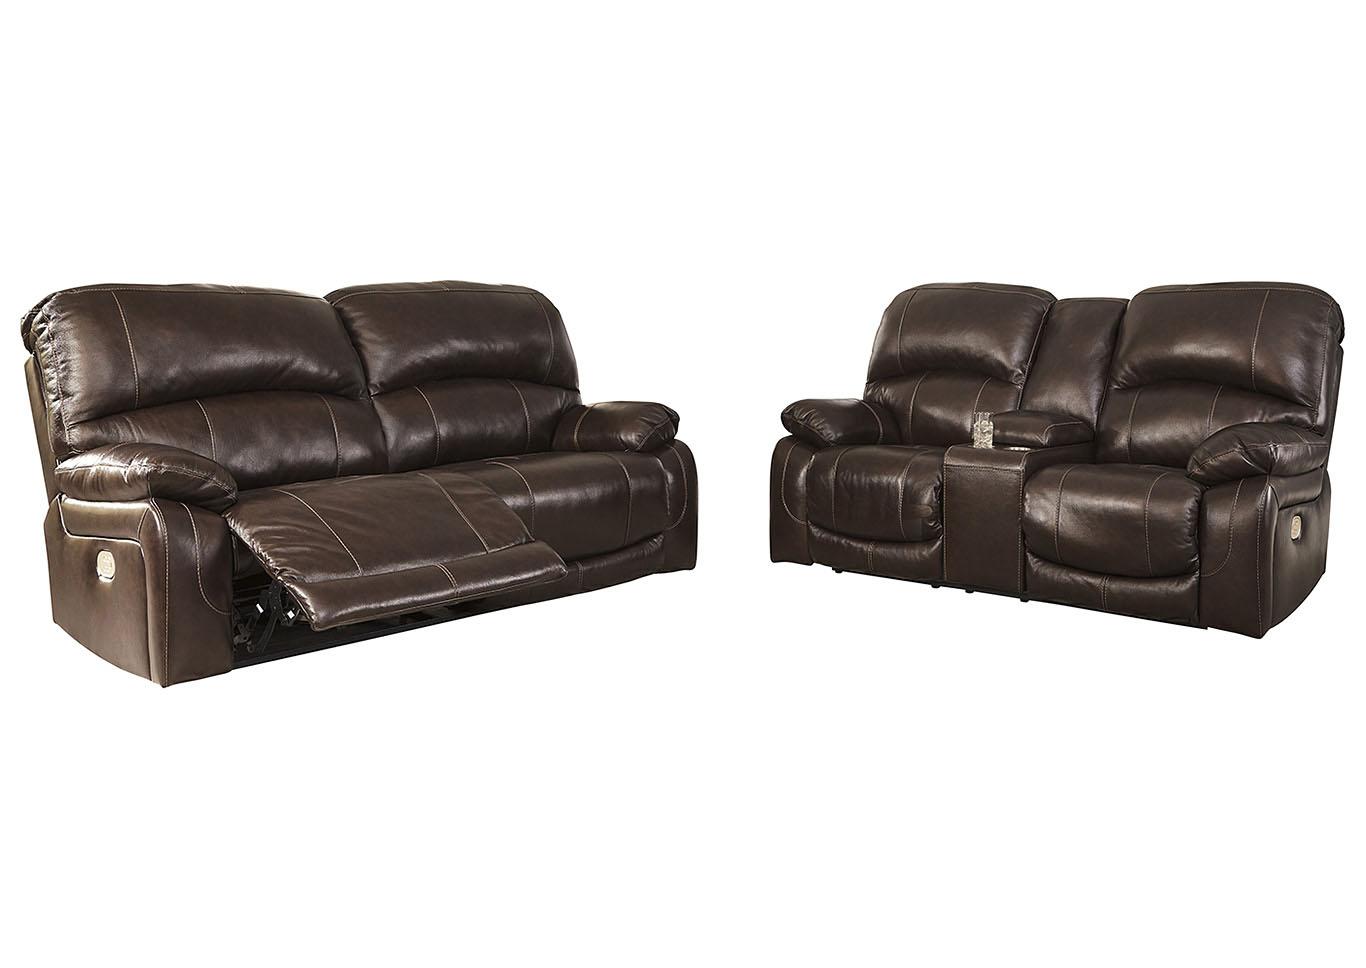 Admirable Country House Furniture Hallstrung Chocolate Power Reclining Uwap Interior Chair Design Uwaporg